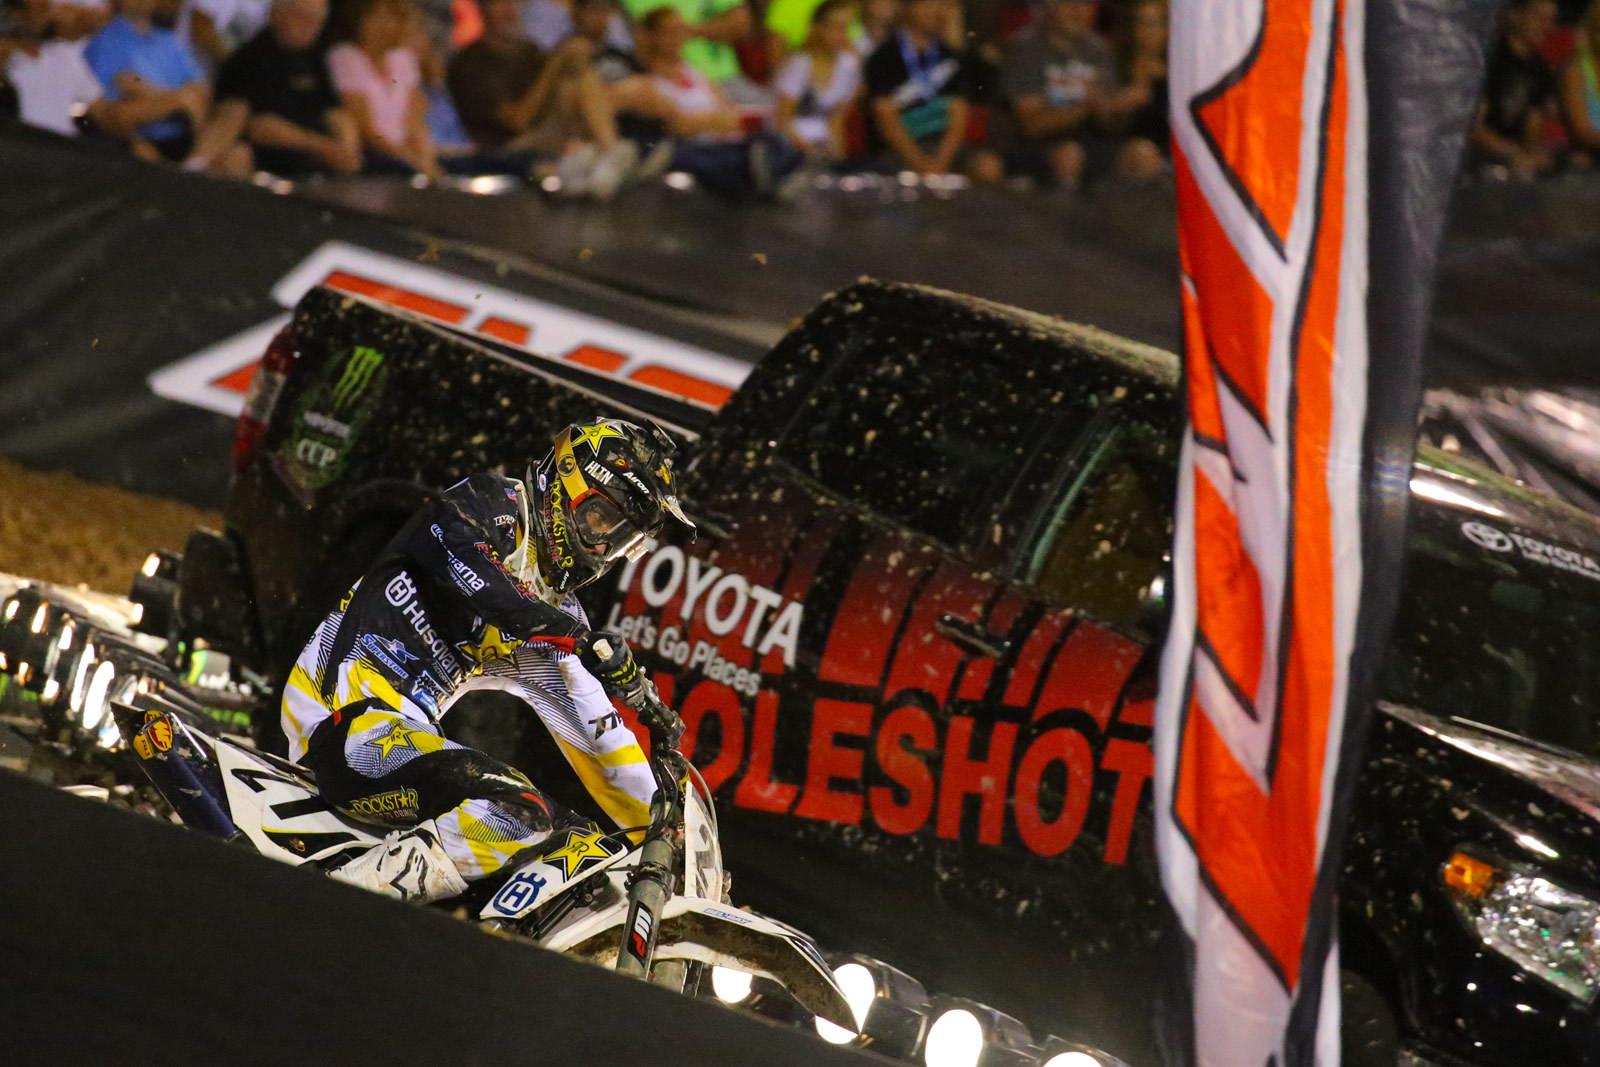 Jason Anderson - Vital MX Pit Bits: Monster Energy Cup - Motocross Pictures - Vital MX